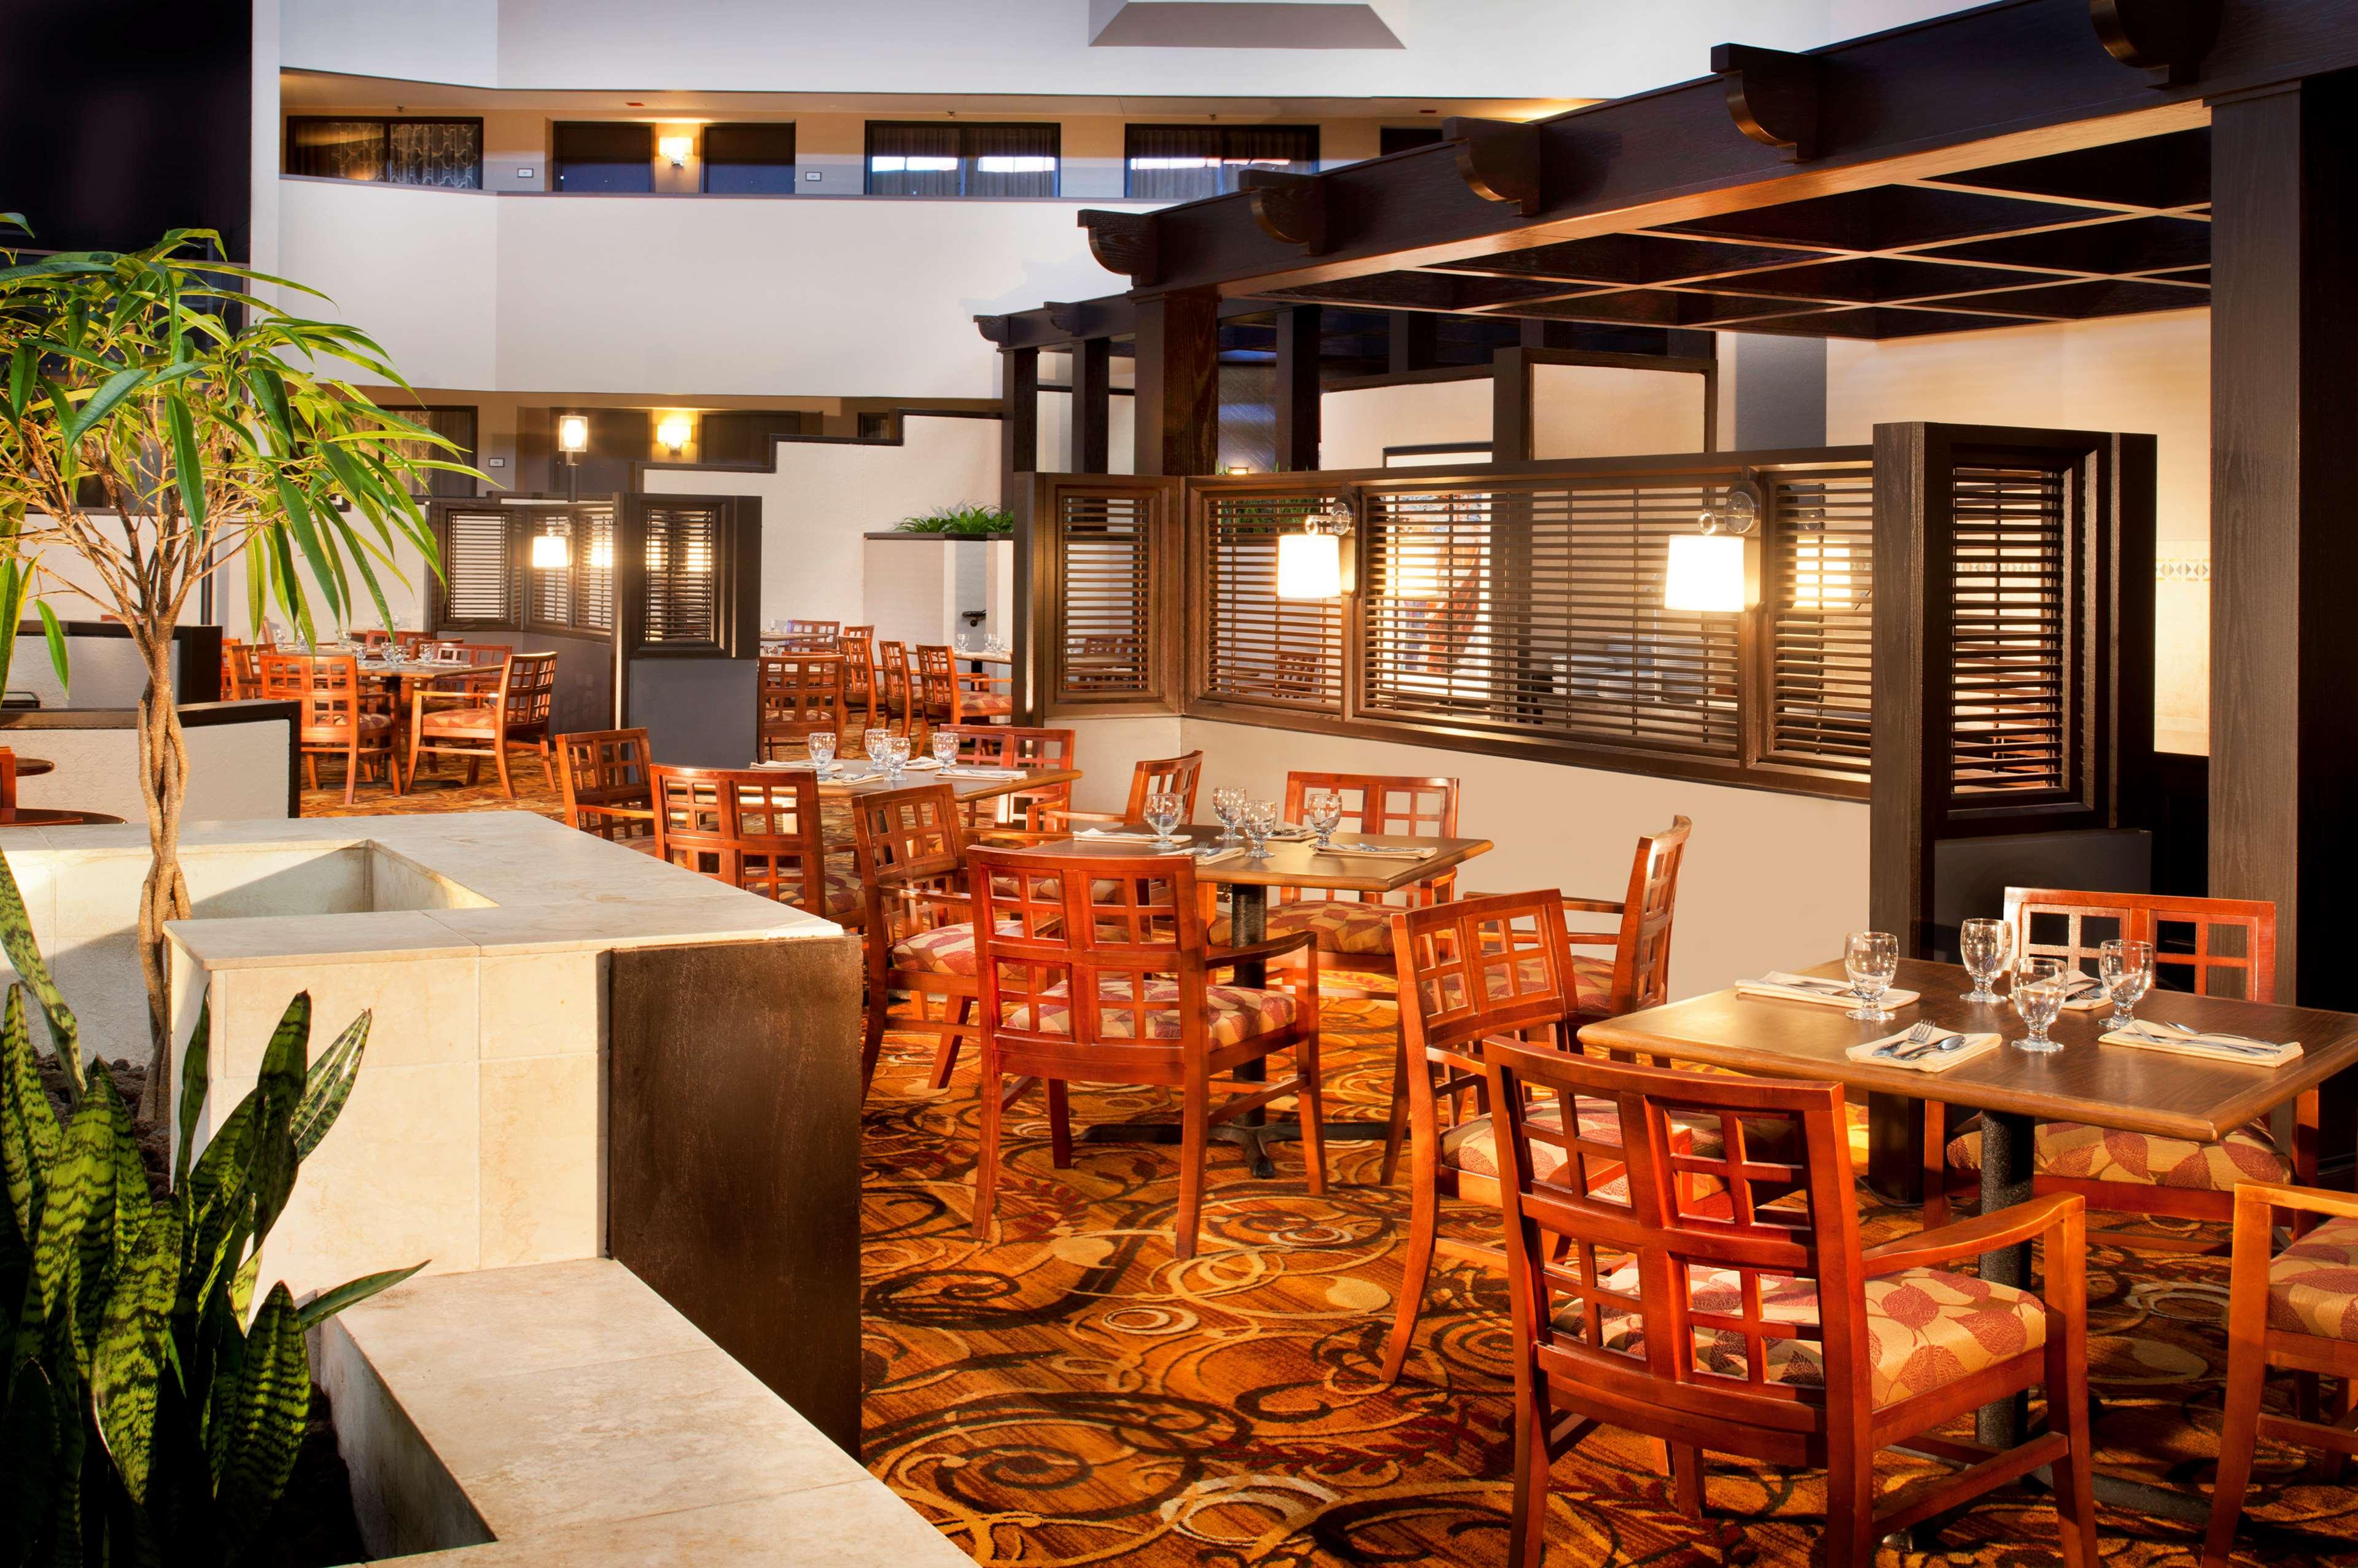 AdBook your Hotel in Minneapolis MN online. No reservation costs. Great migom-zaim.ga: Hotels, Apartments, Villas, Hostels, Resorts, B&Bs.